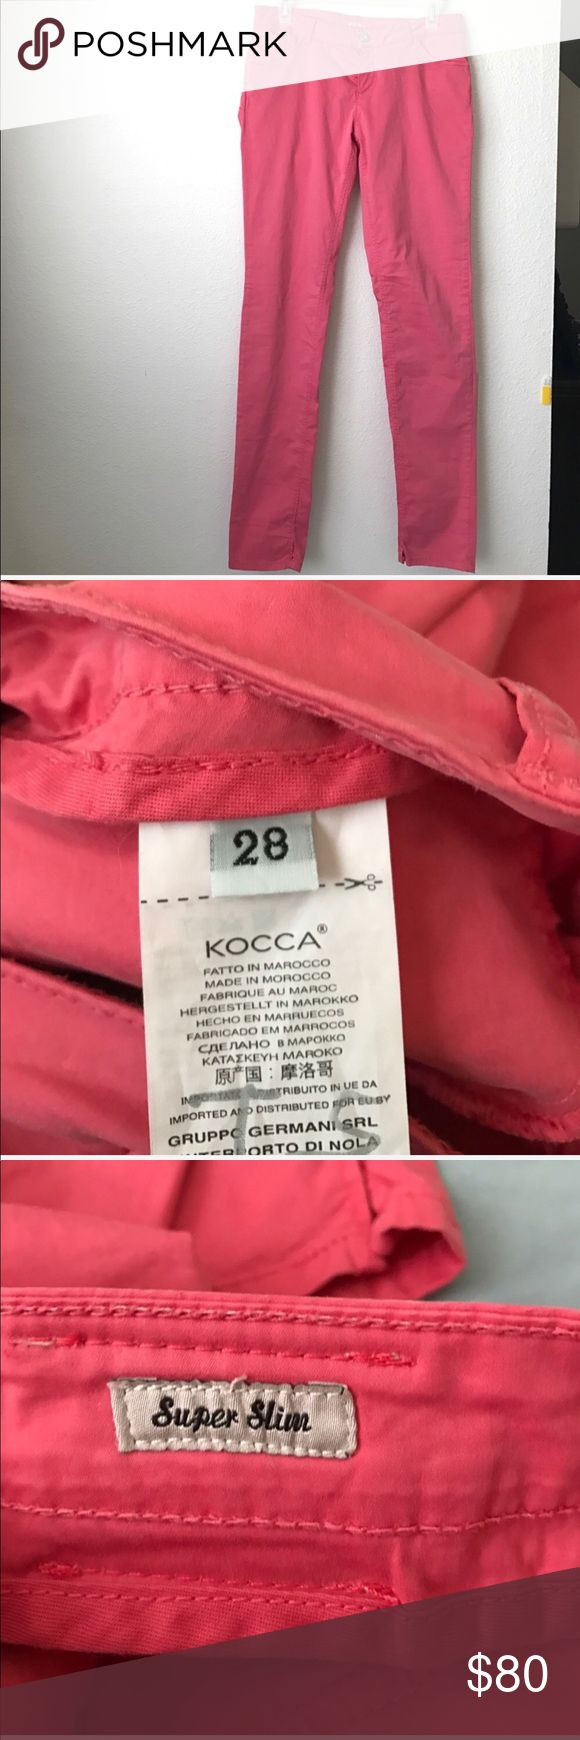 KOCCA Pink/Salmon Pants Super Slim 6/28 KOCCA Pink/Salmon Pants Super Slim  Size: 6/28 Fabric: 97% Cotton 3% Elastane Waist: 28 Inseam: 31 No snags, rips, Smoke Free House kocca Pants